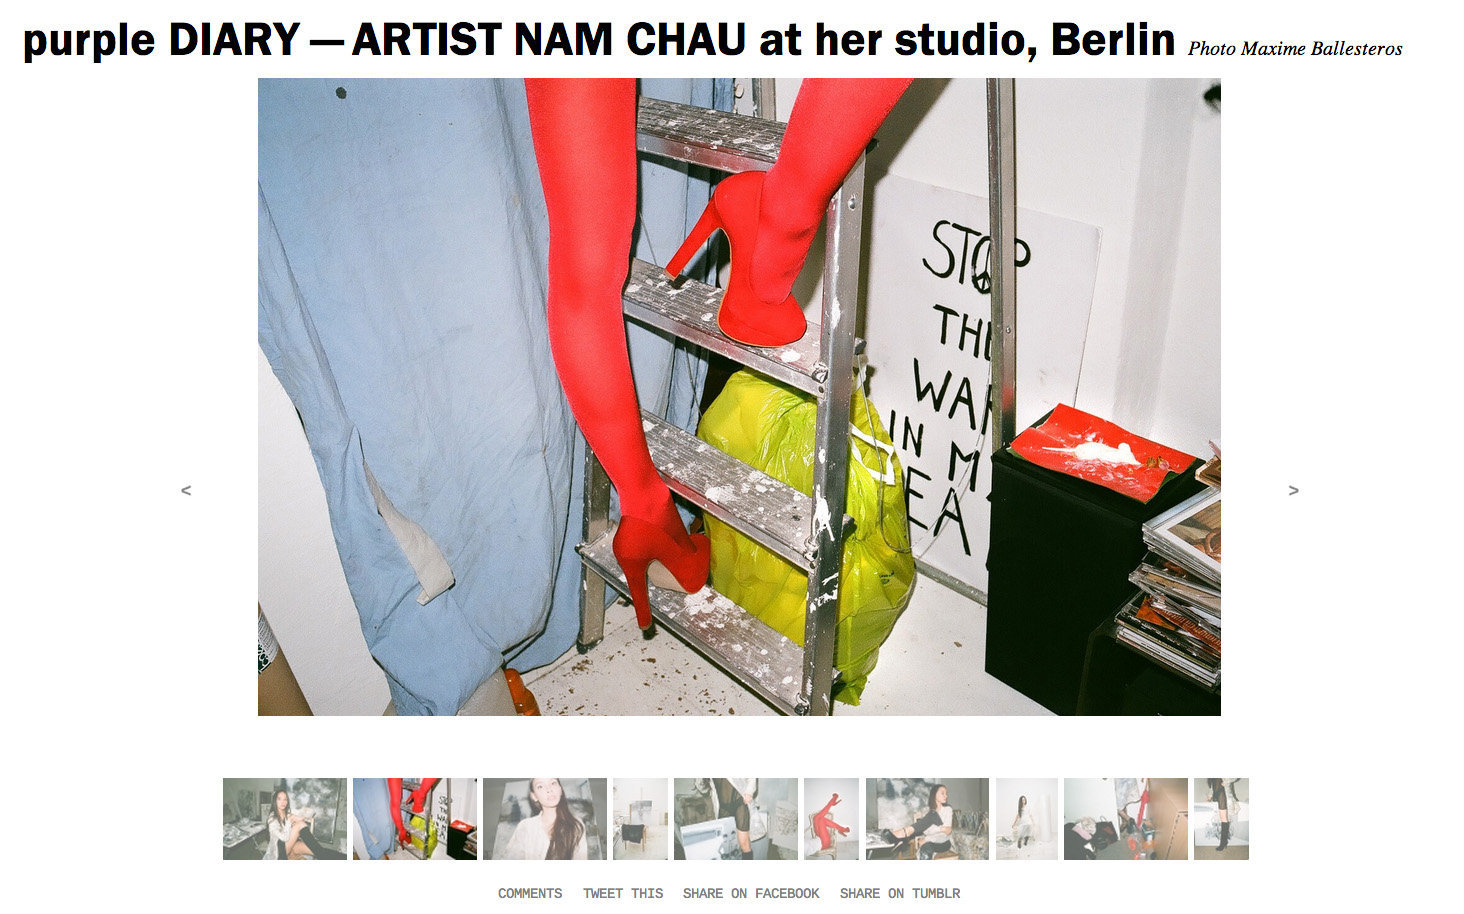 purple DIARY   ARTIST NAM CHAU at her studio  Berlin.jpg